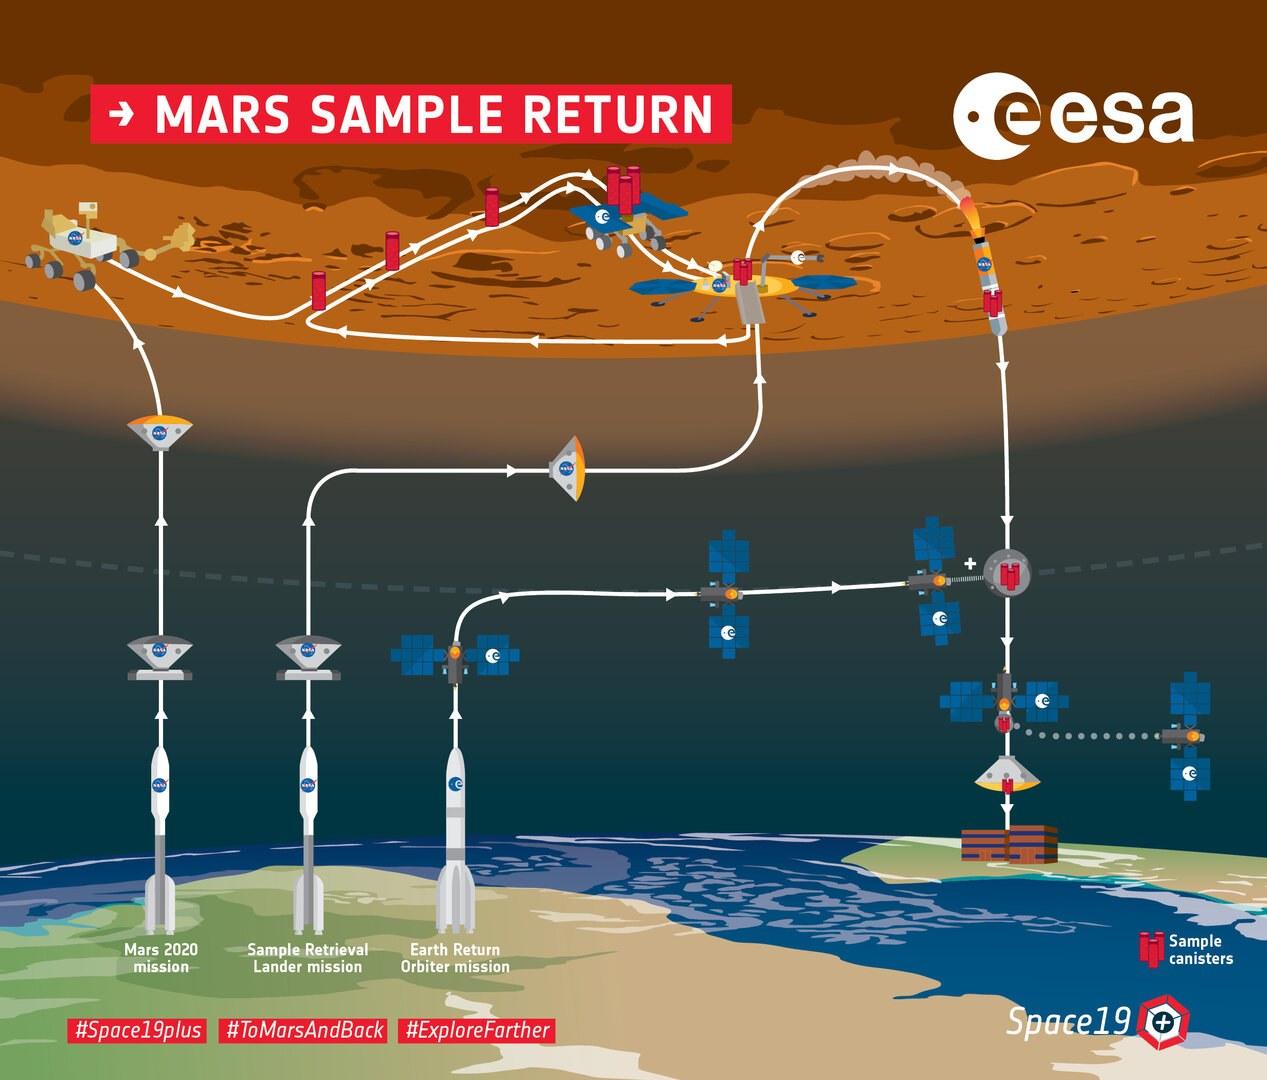 Mars Sample Return IMOST Maria Paz Zorzano